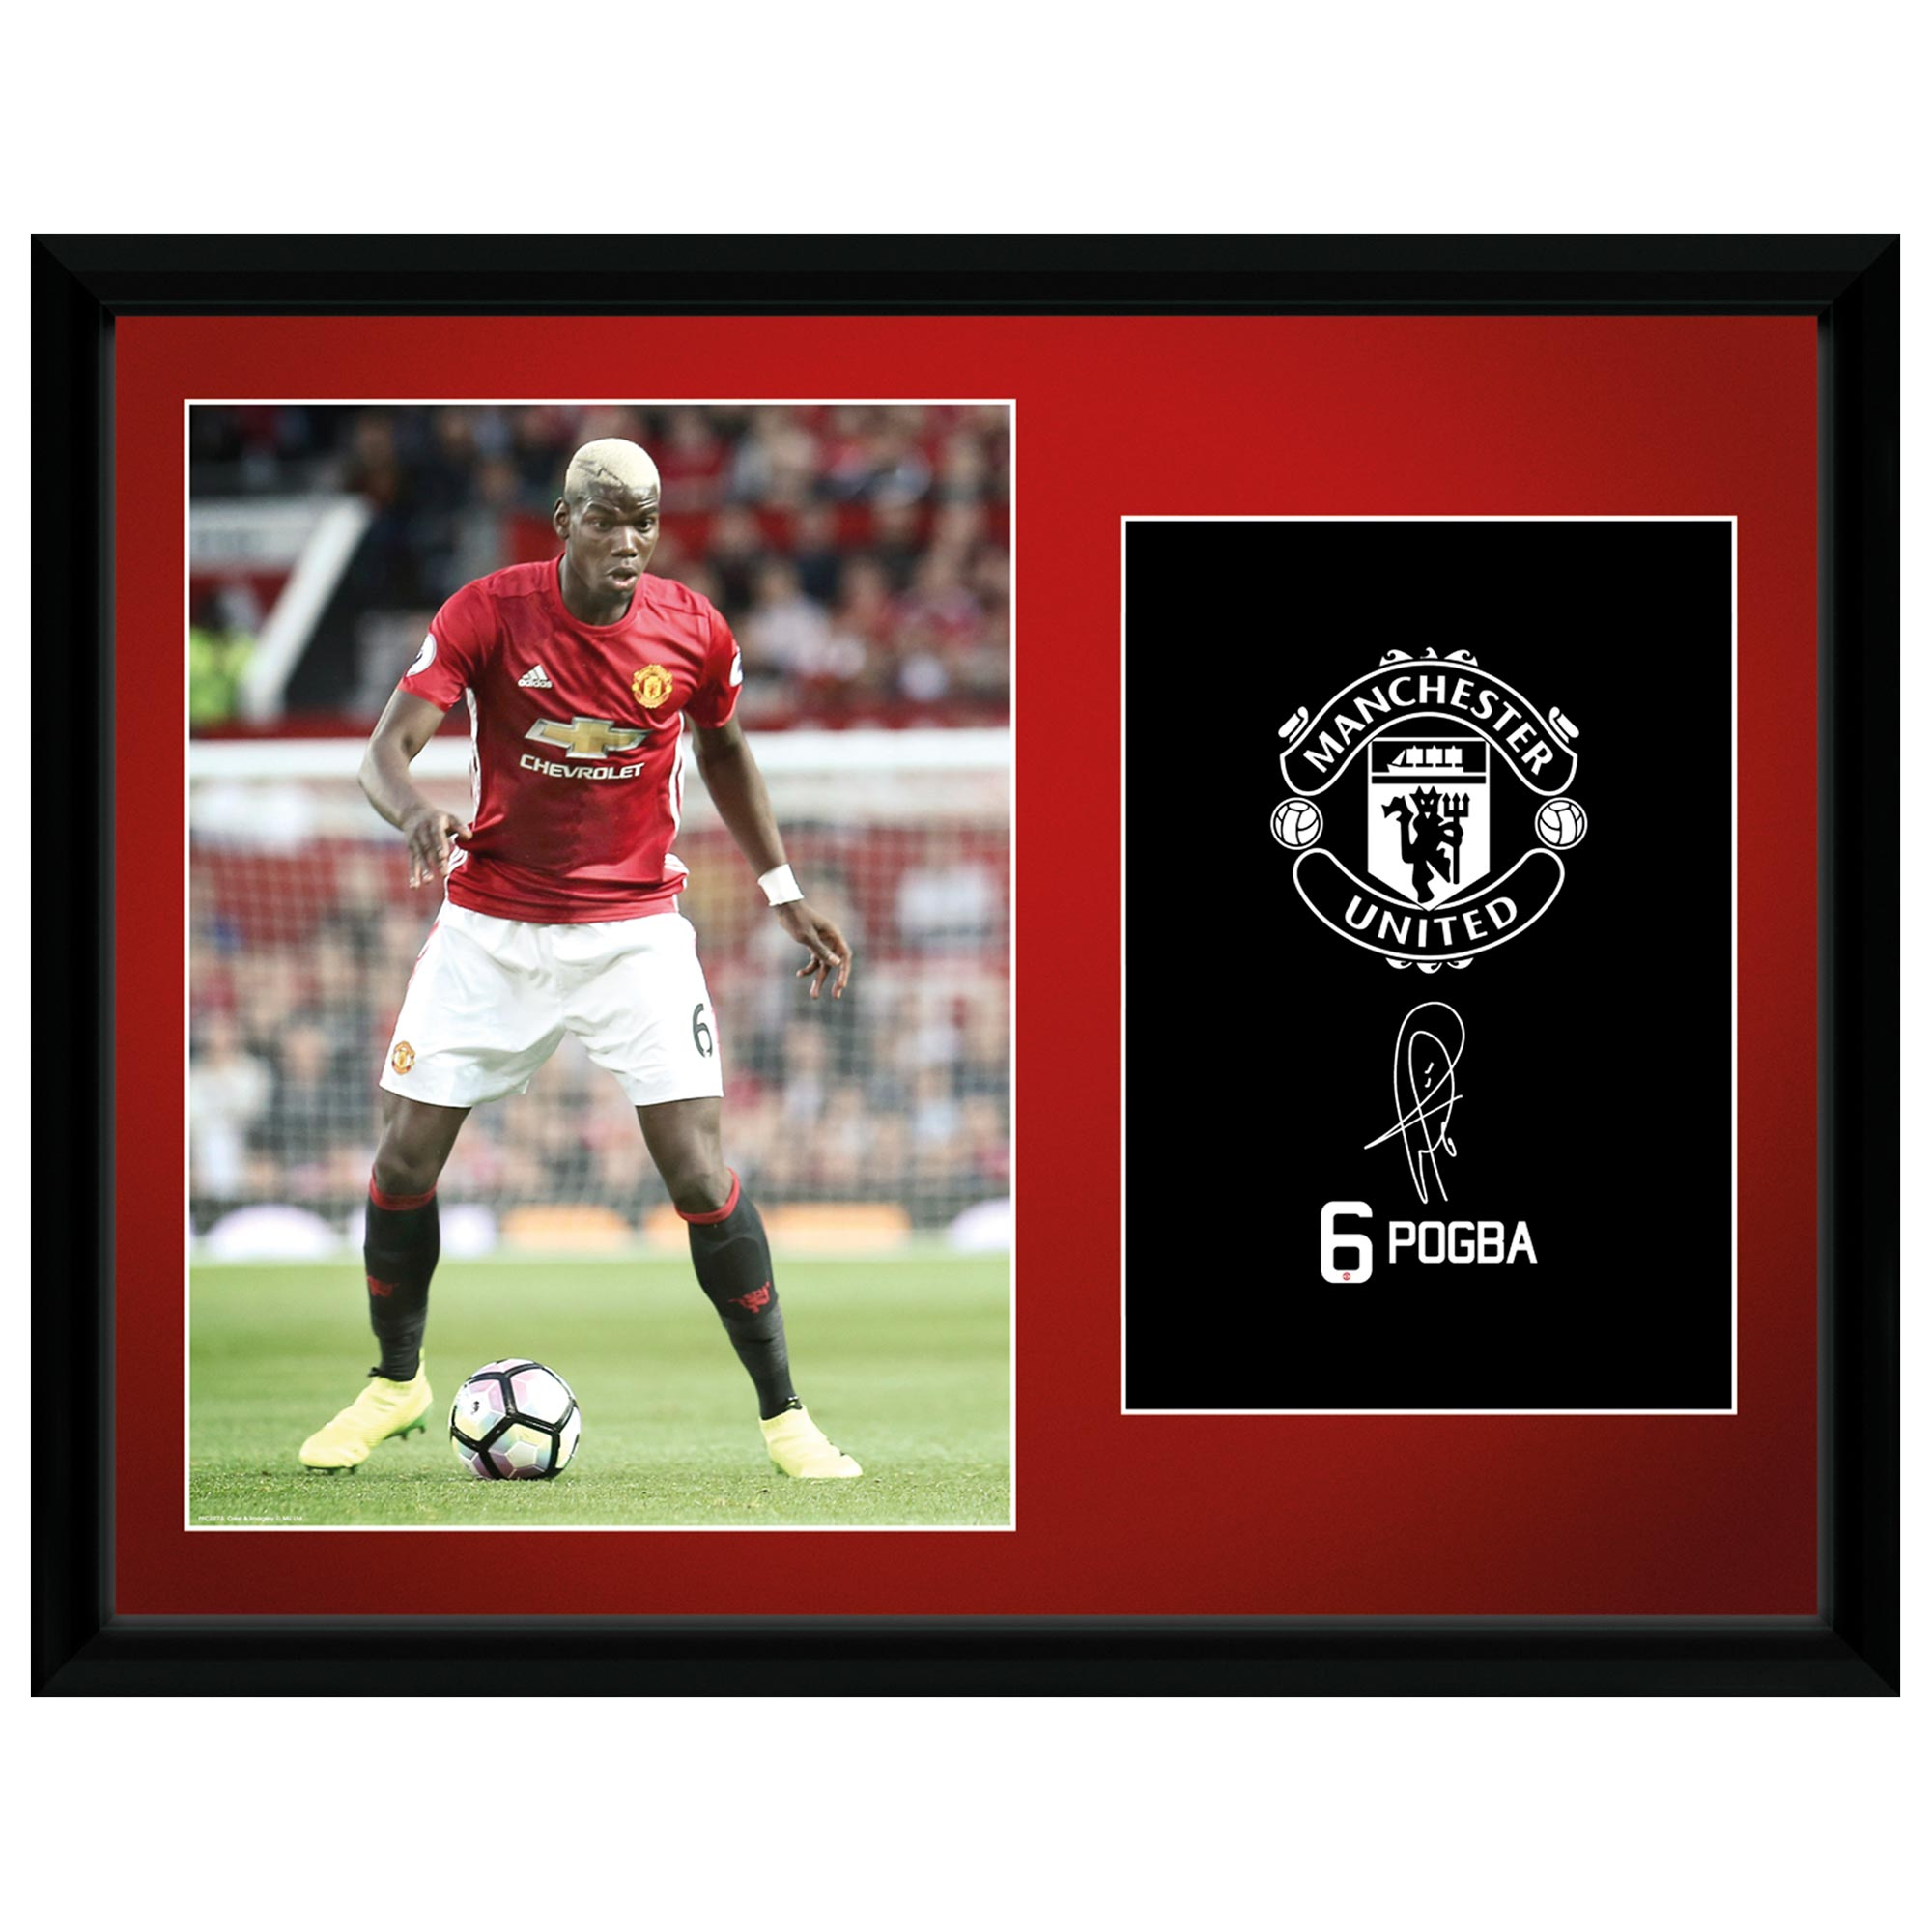 Manchester United 16-17 Pogba Framed Print 16 x 12